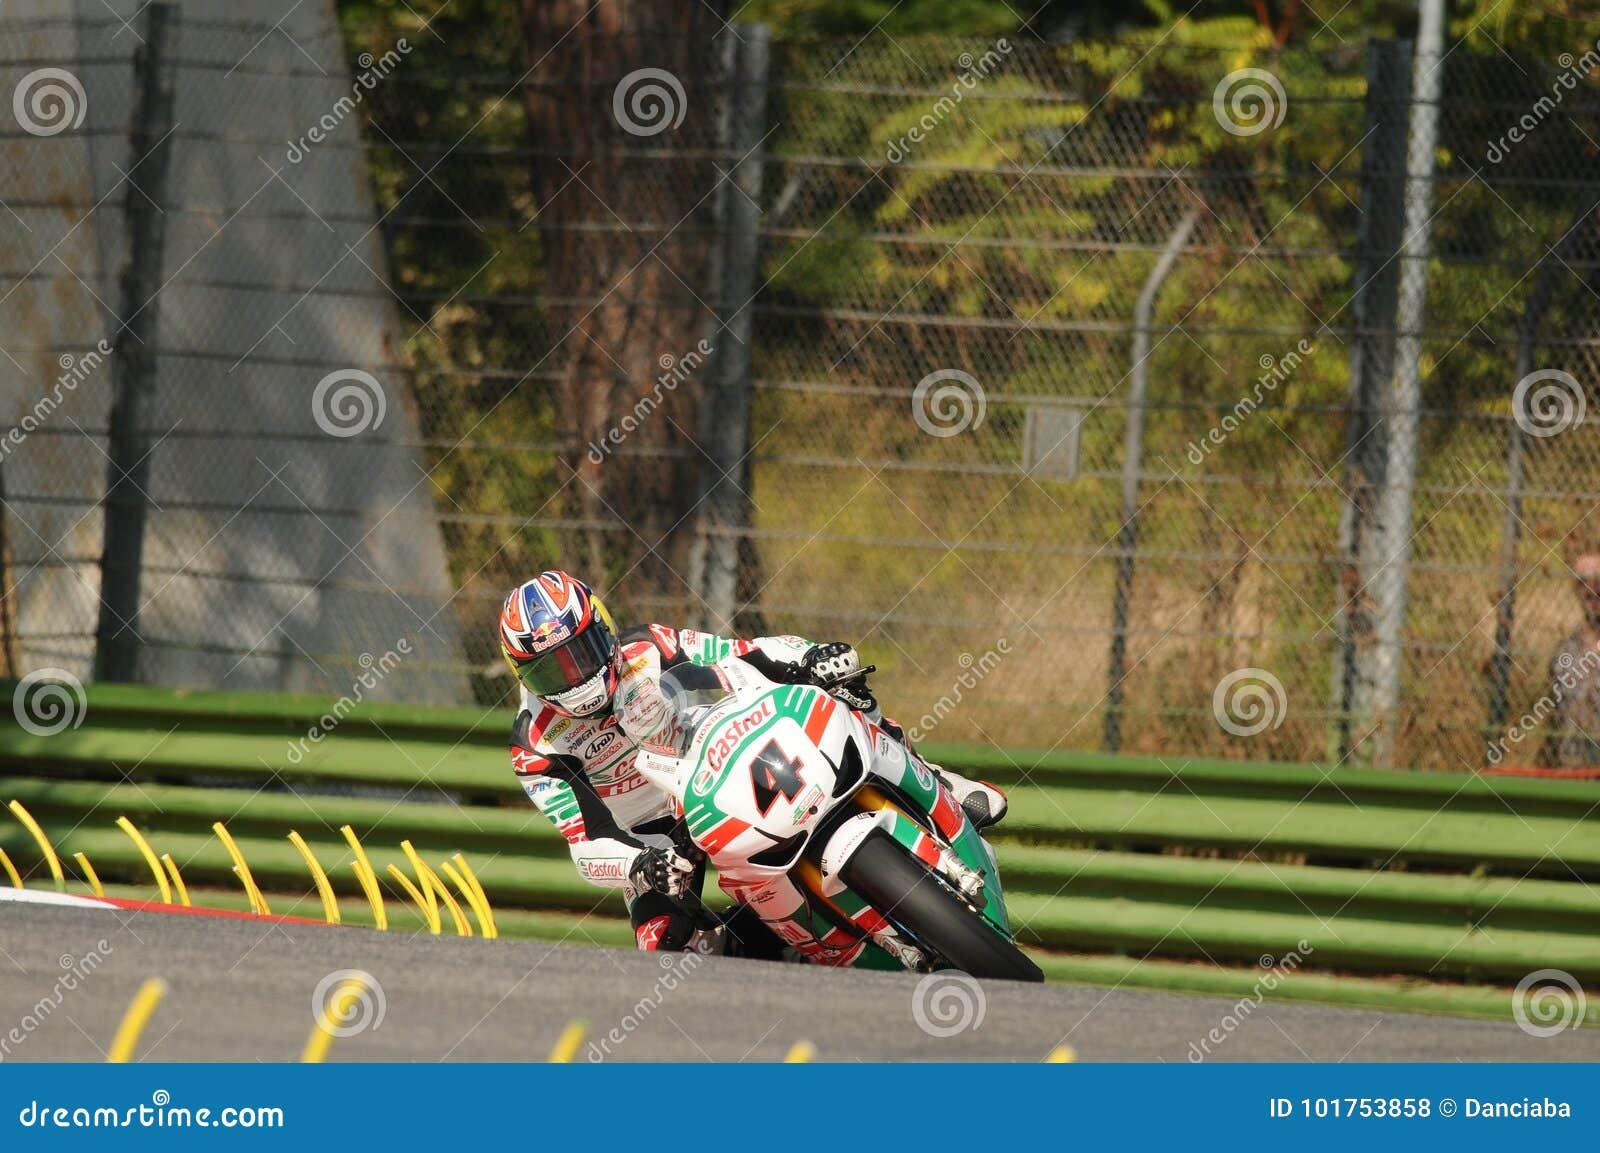 Jonathan Rea GBR Honda CBR1000RR Castrol Honda στη δράση κατά τη διάρκεια της πρακτικής Superbike στο κύκλωμα Imola